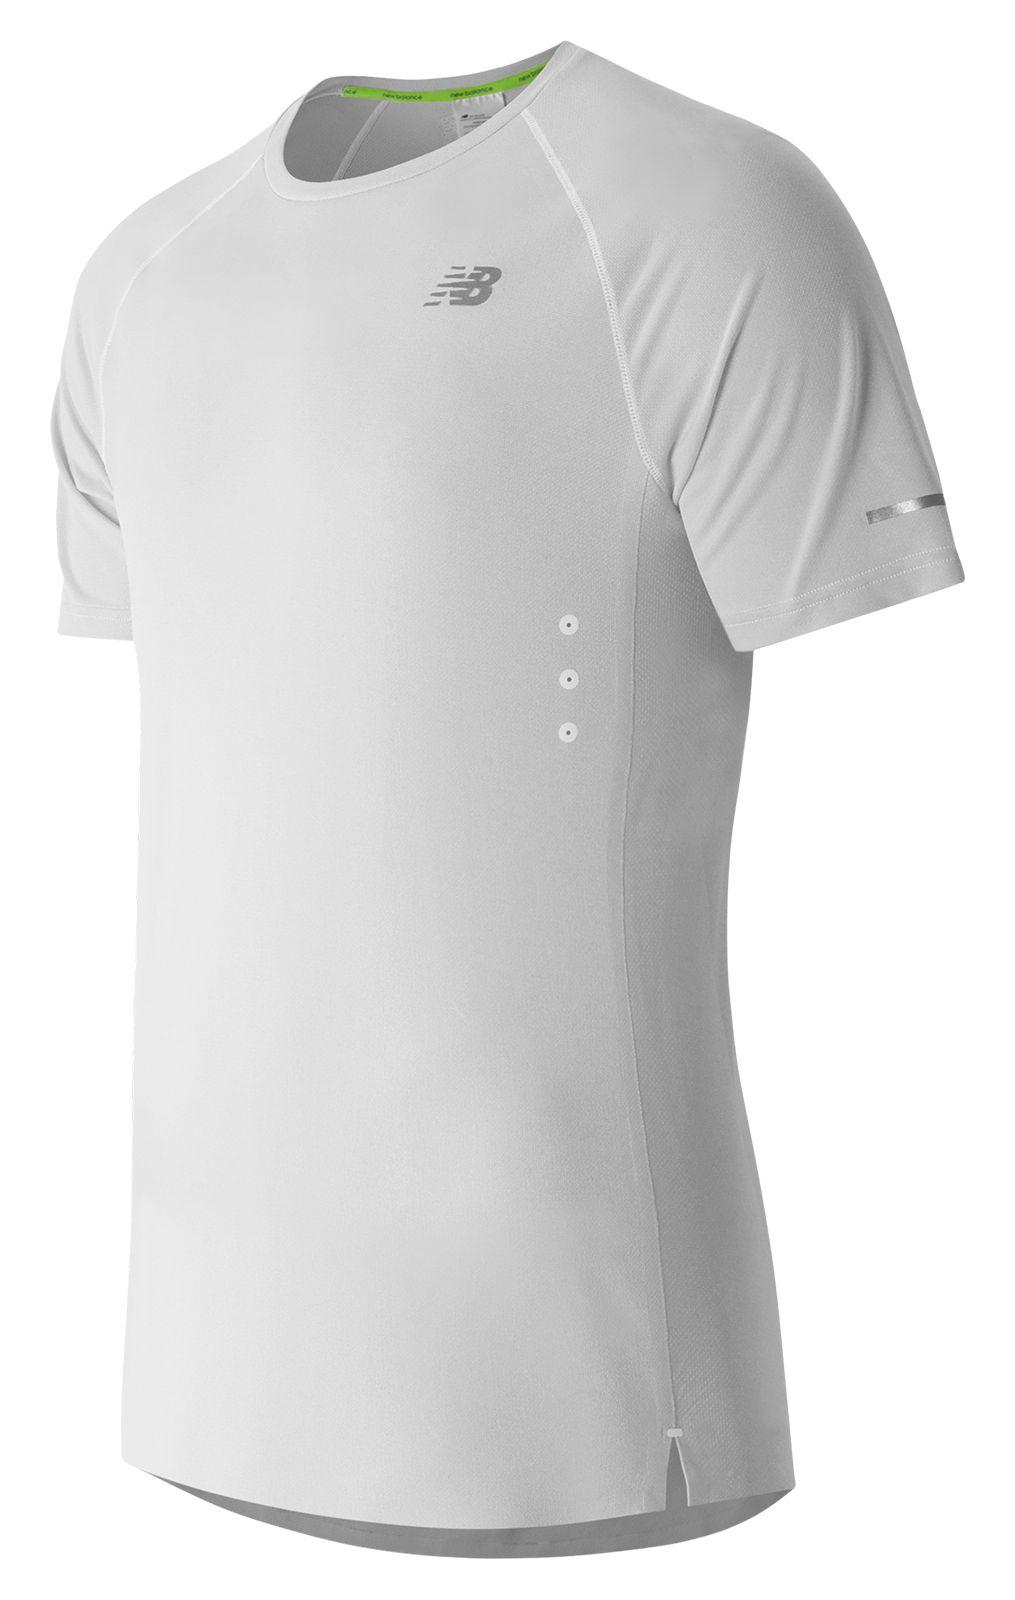 New Balance : Precision Run Short Sleeve : Men's Short Sleeve & Sleeveless Shirts : MT61218WT